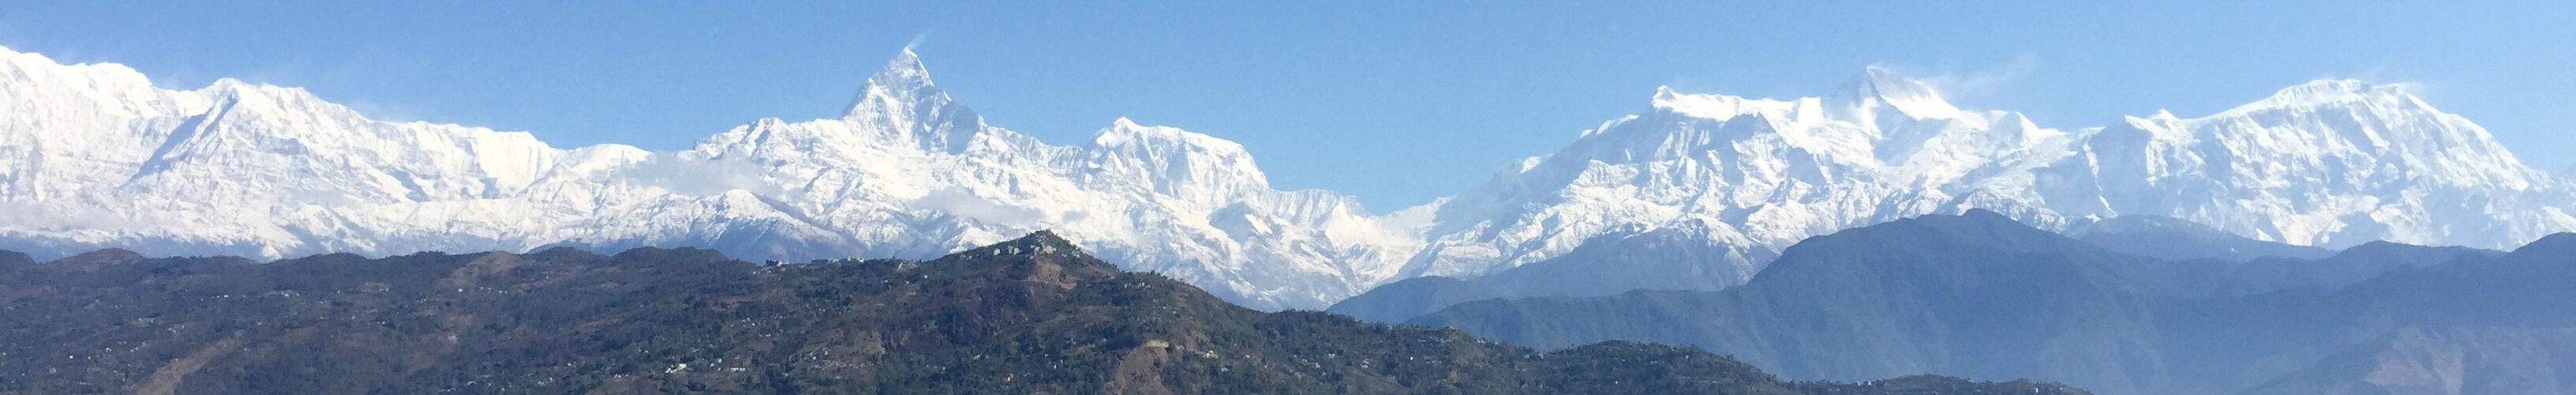 Fiskehalebjerget i Nepal